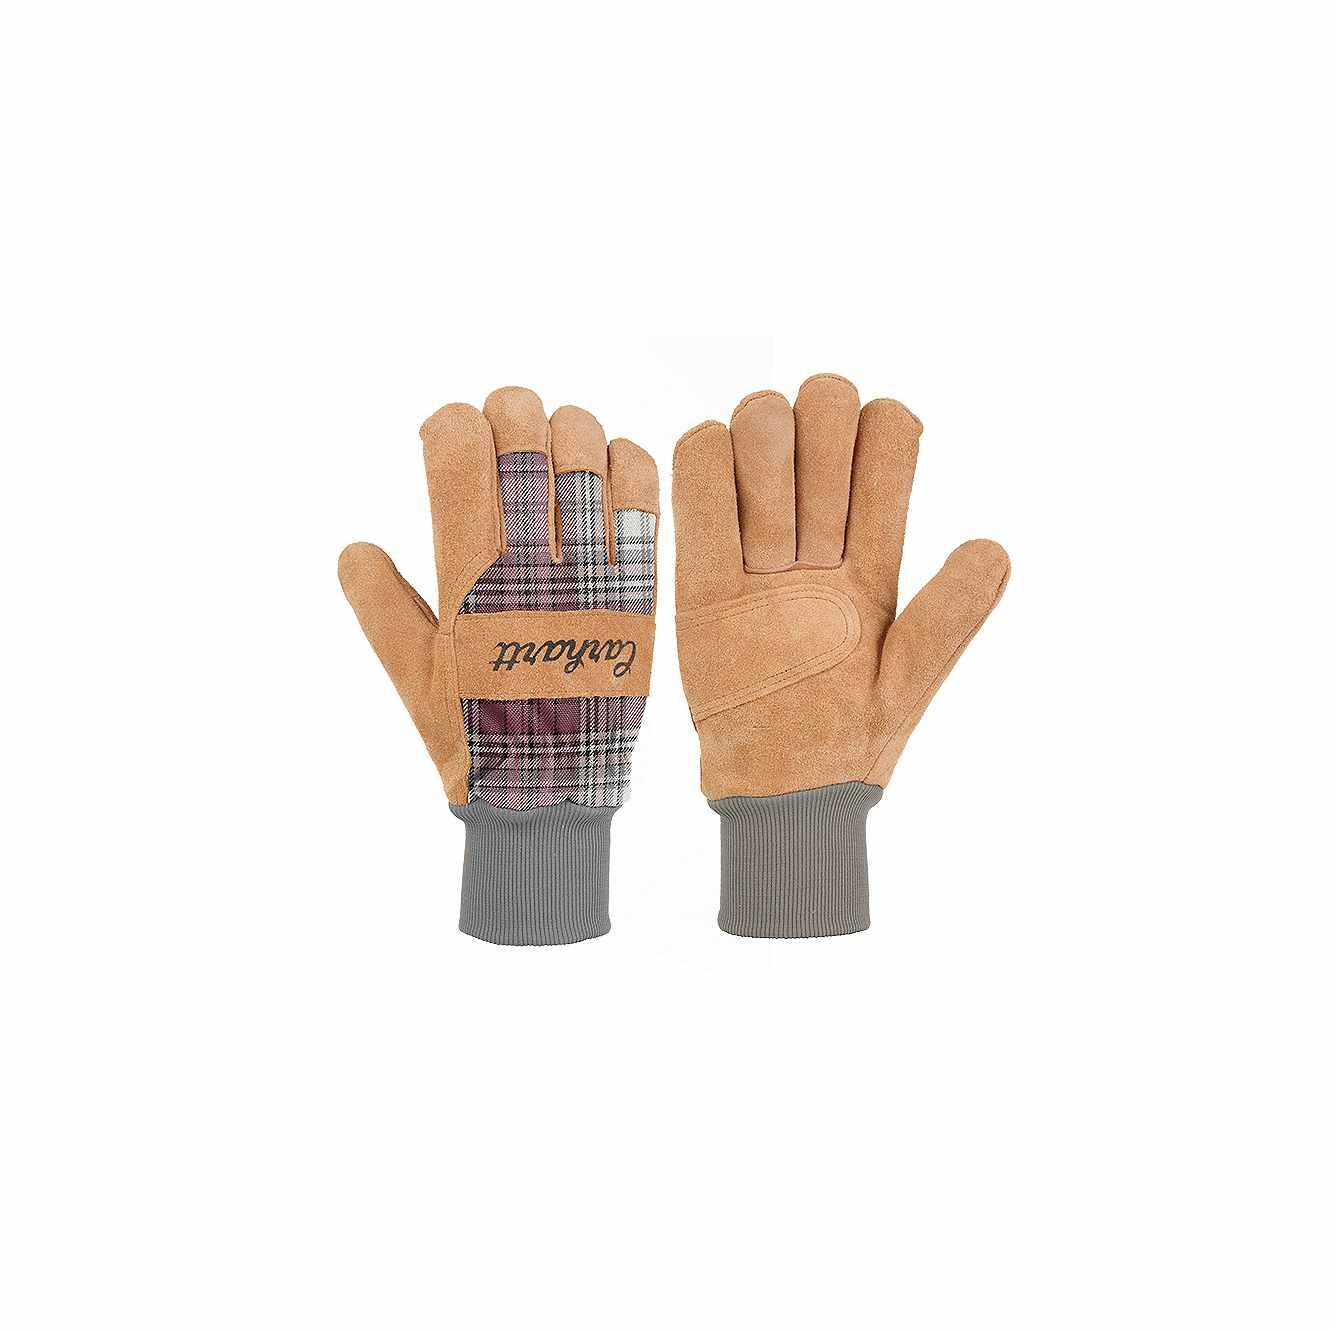 Picture of Suede Knit-Cuff Work Glove in Wild Rose Plaid